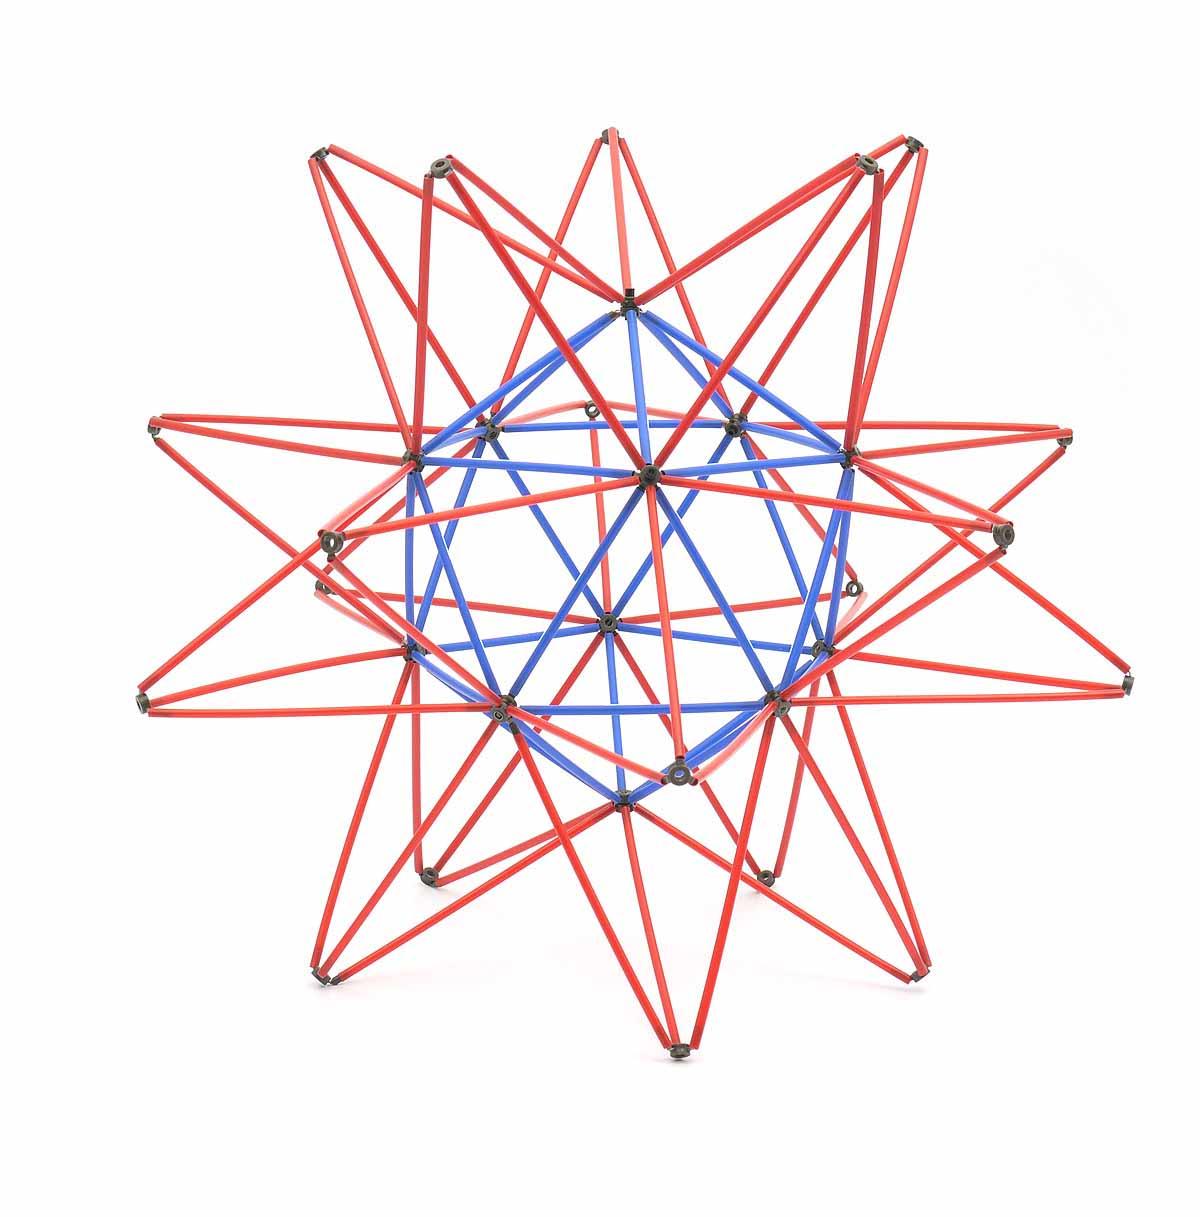 Orbit Material For Mathematics Class Set 2d And 3d Shapes Diamond Kite Diagram Malay